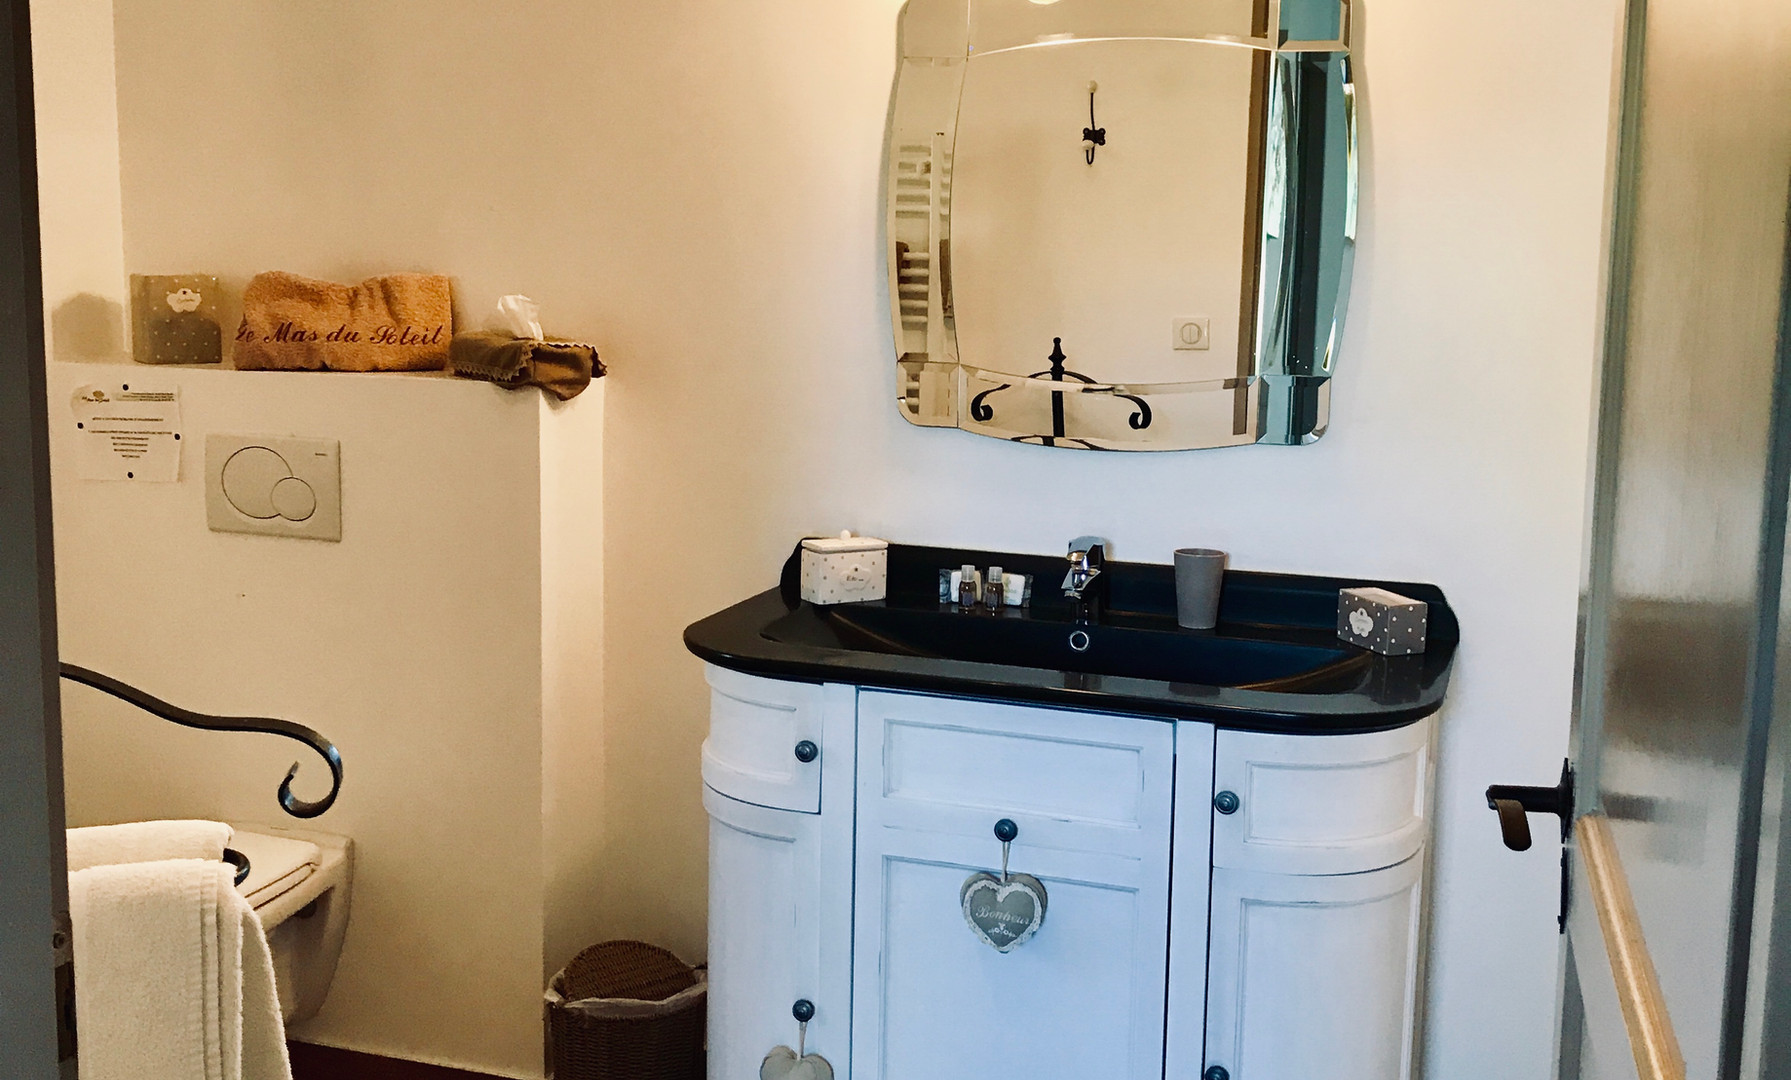 Appartement 2 chambres Cosy salle de bain